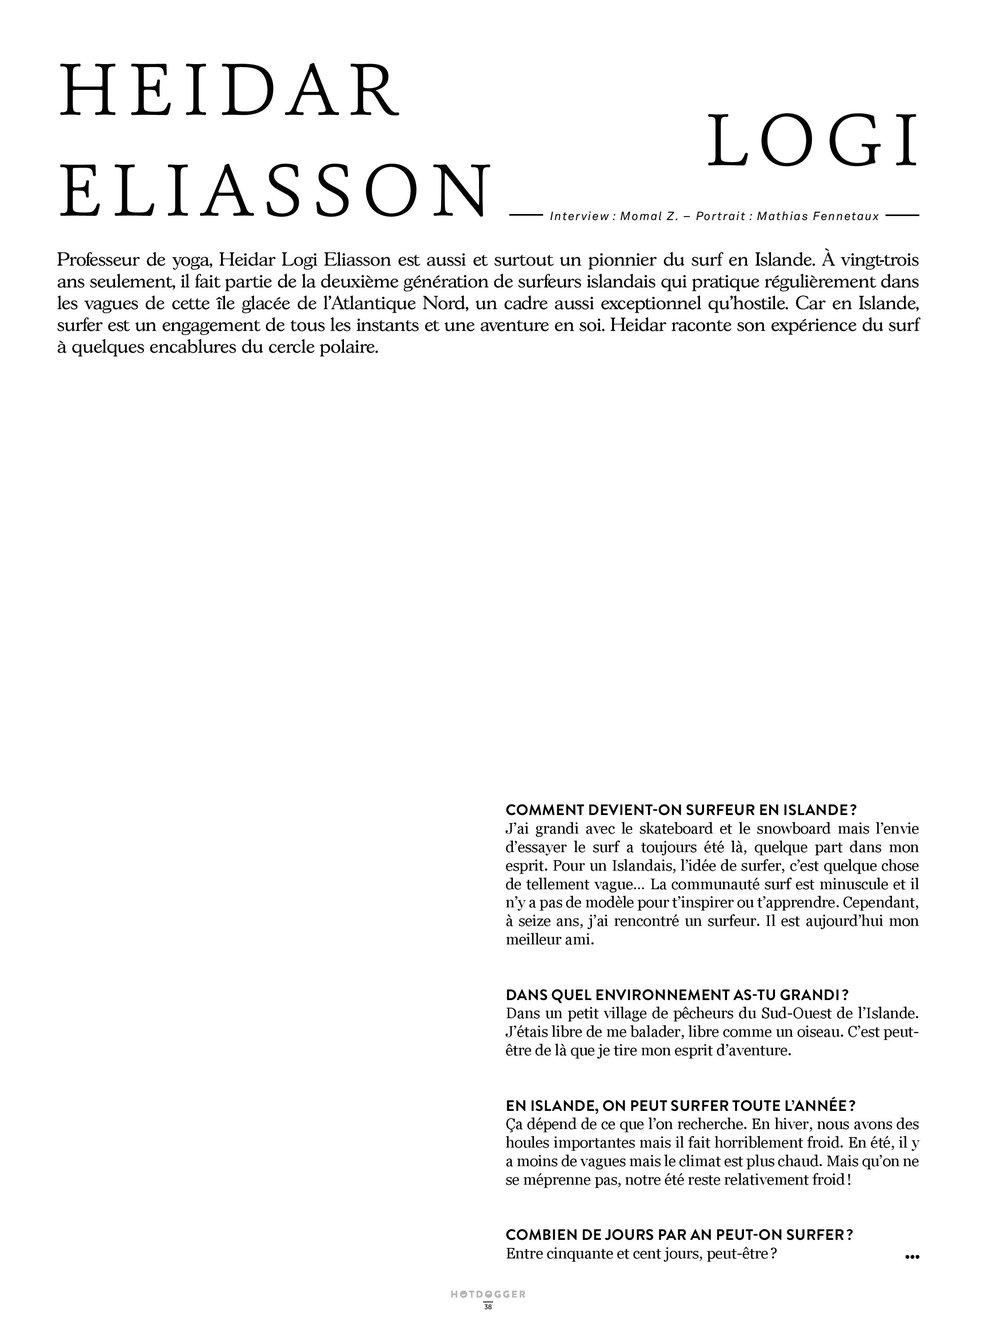 HeidarHOTDOGGER7-page-001.jpg